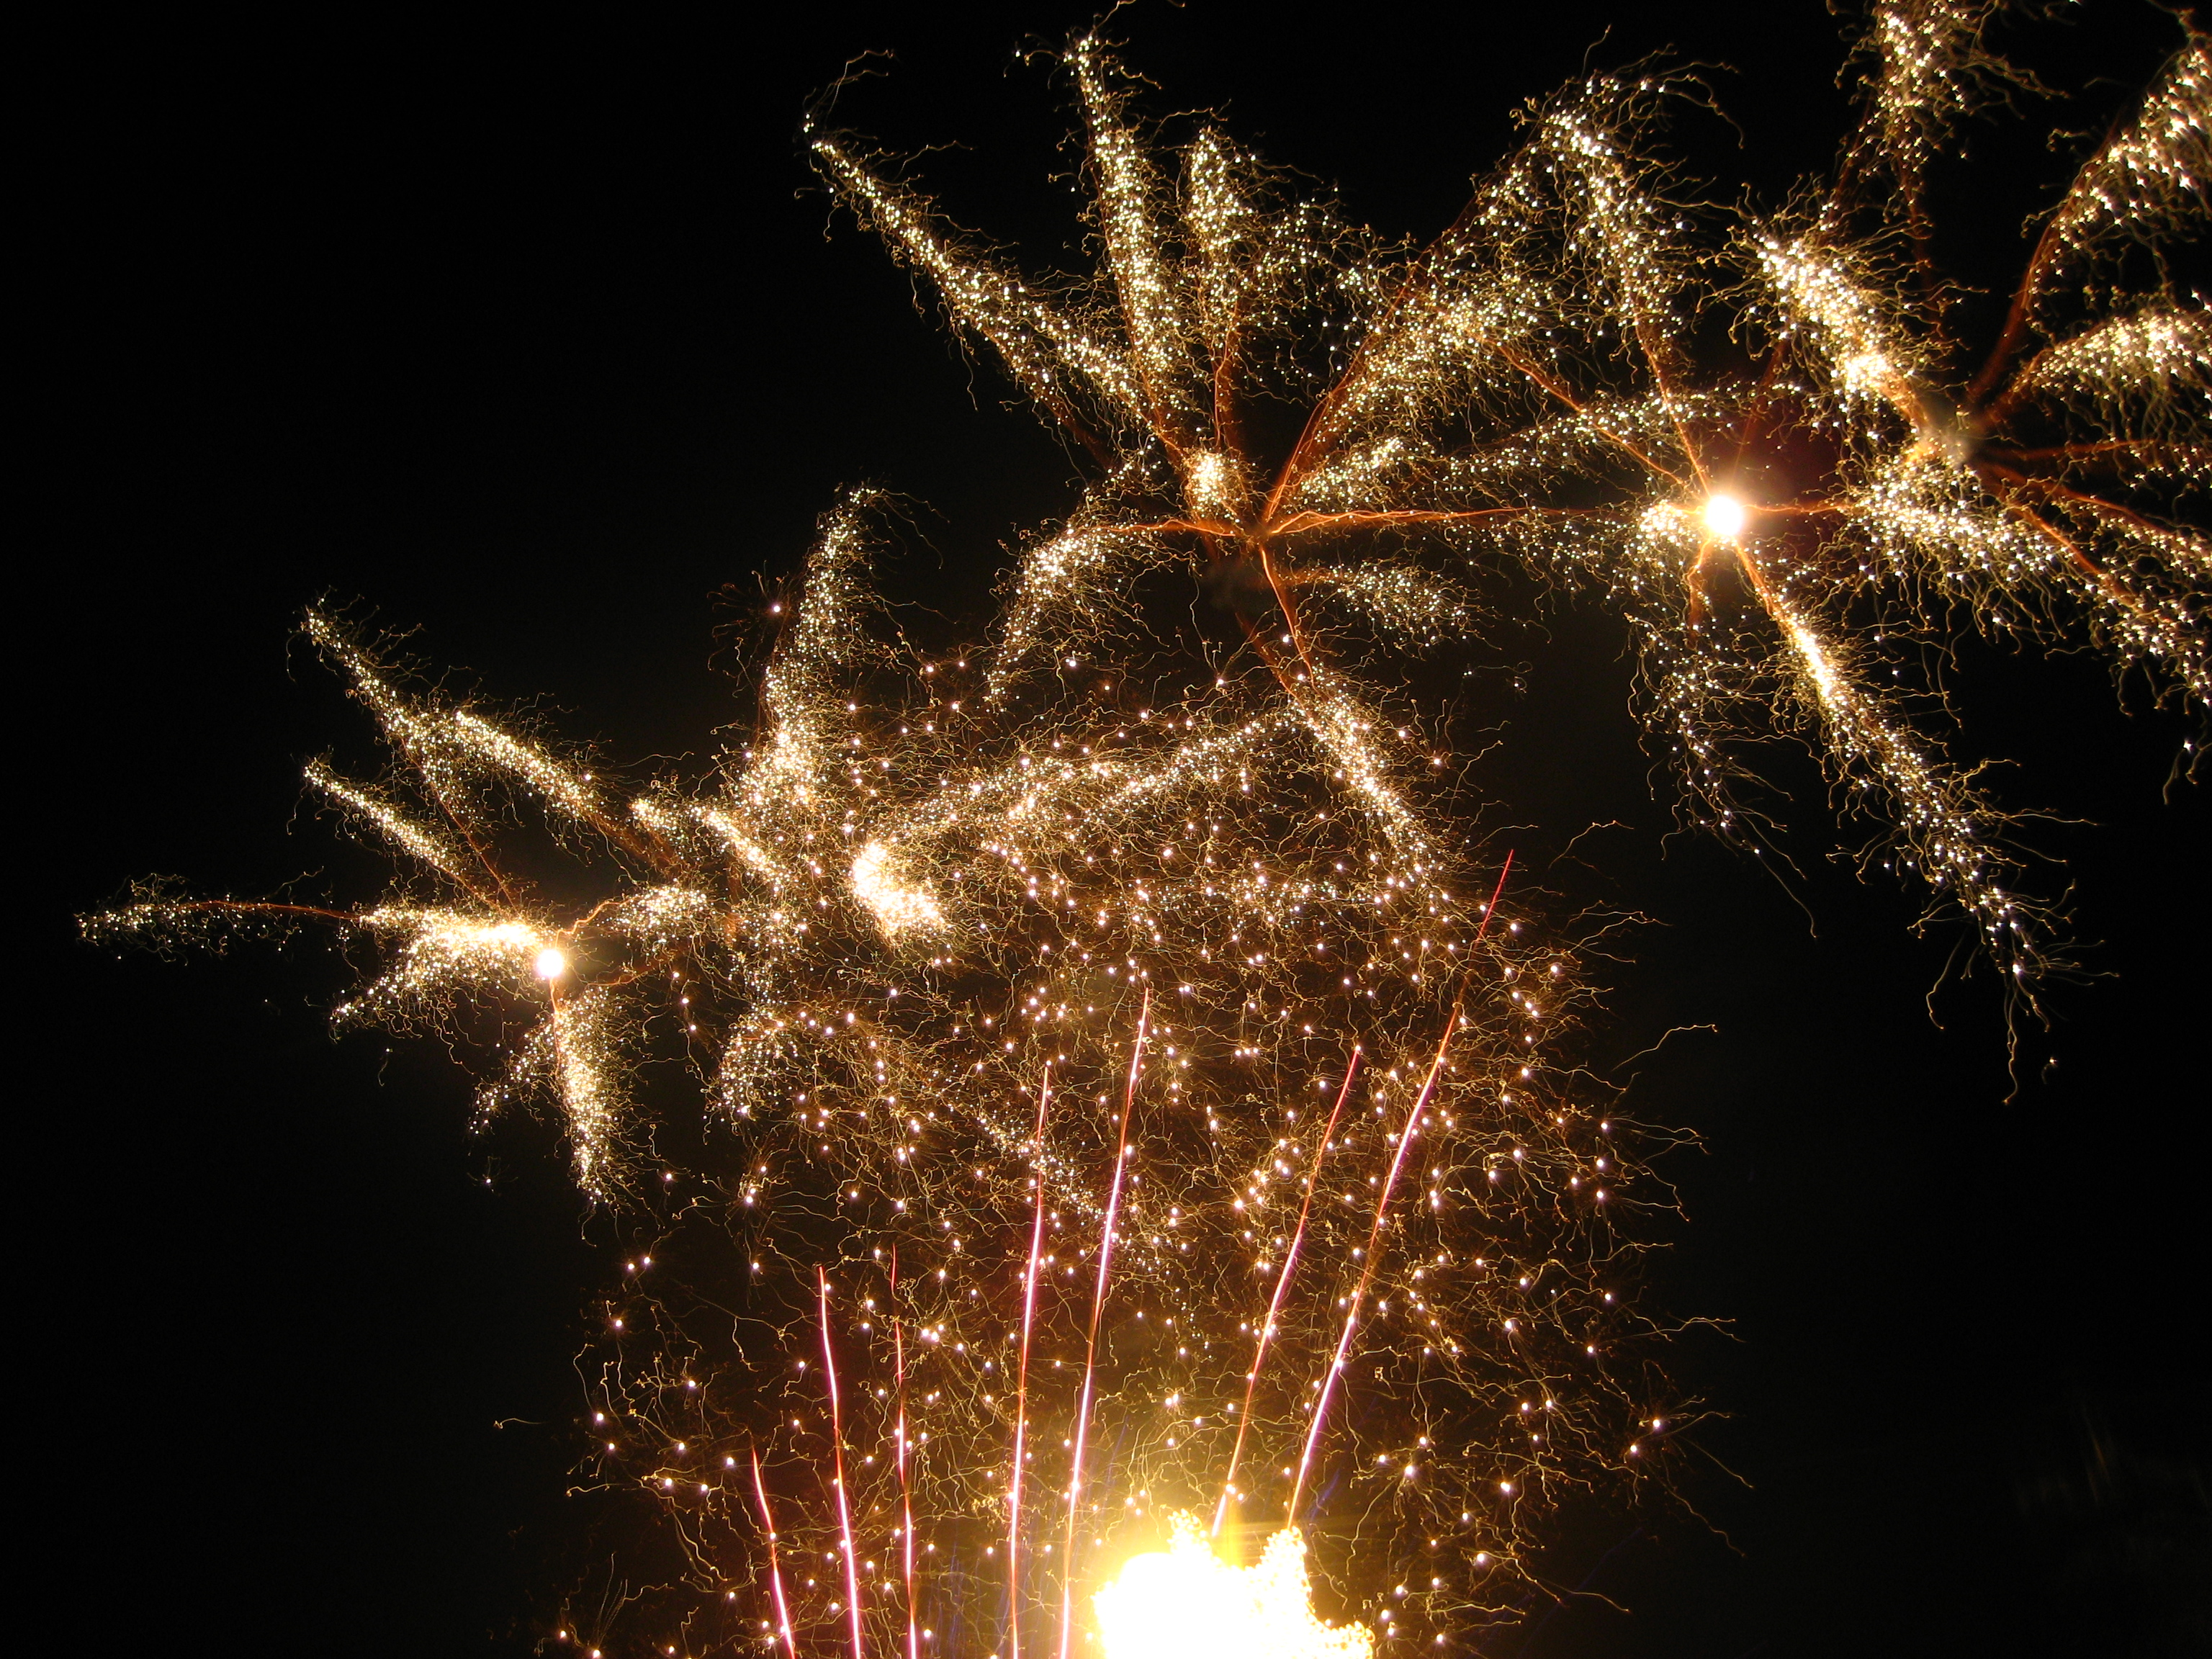 ferragosto-puglia-fireworks-parades-panzerotti-calzones